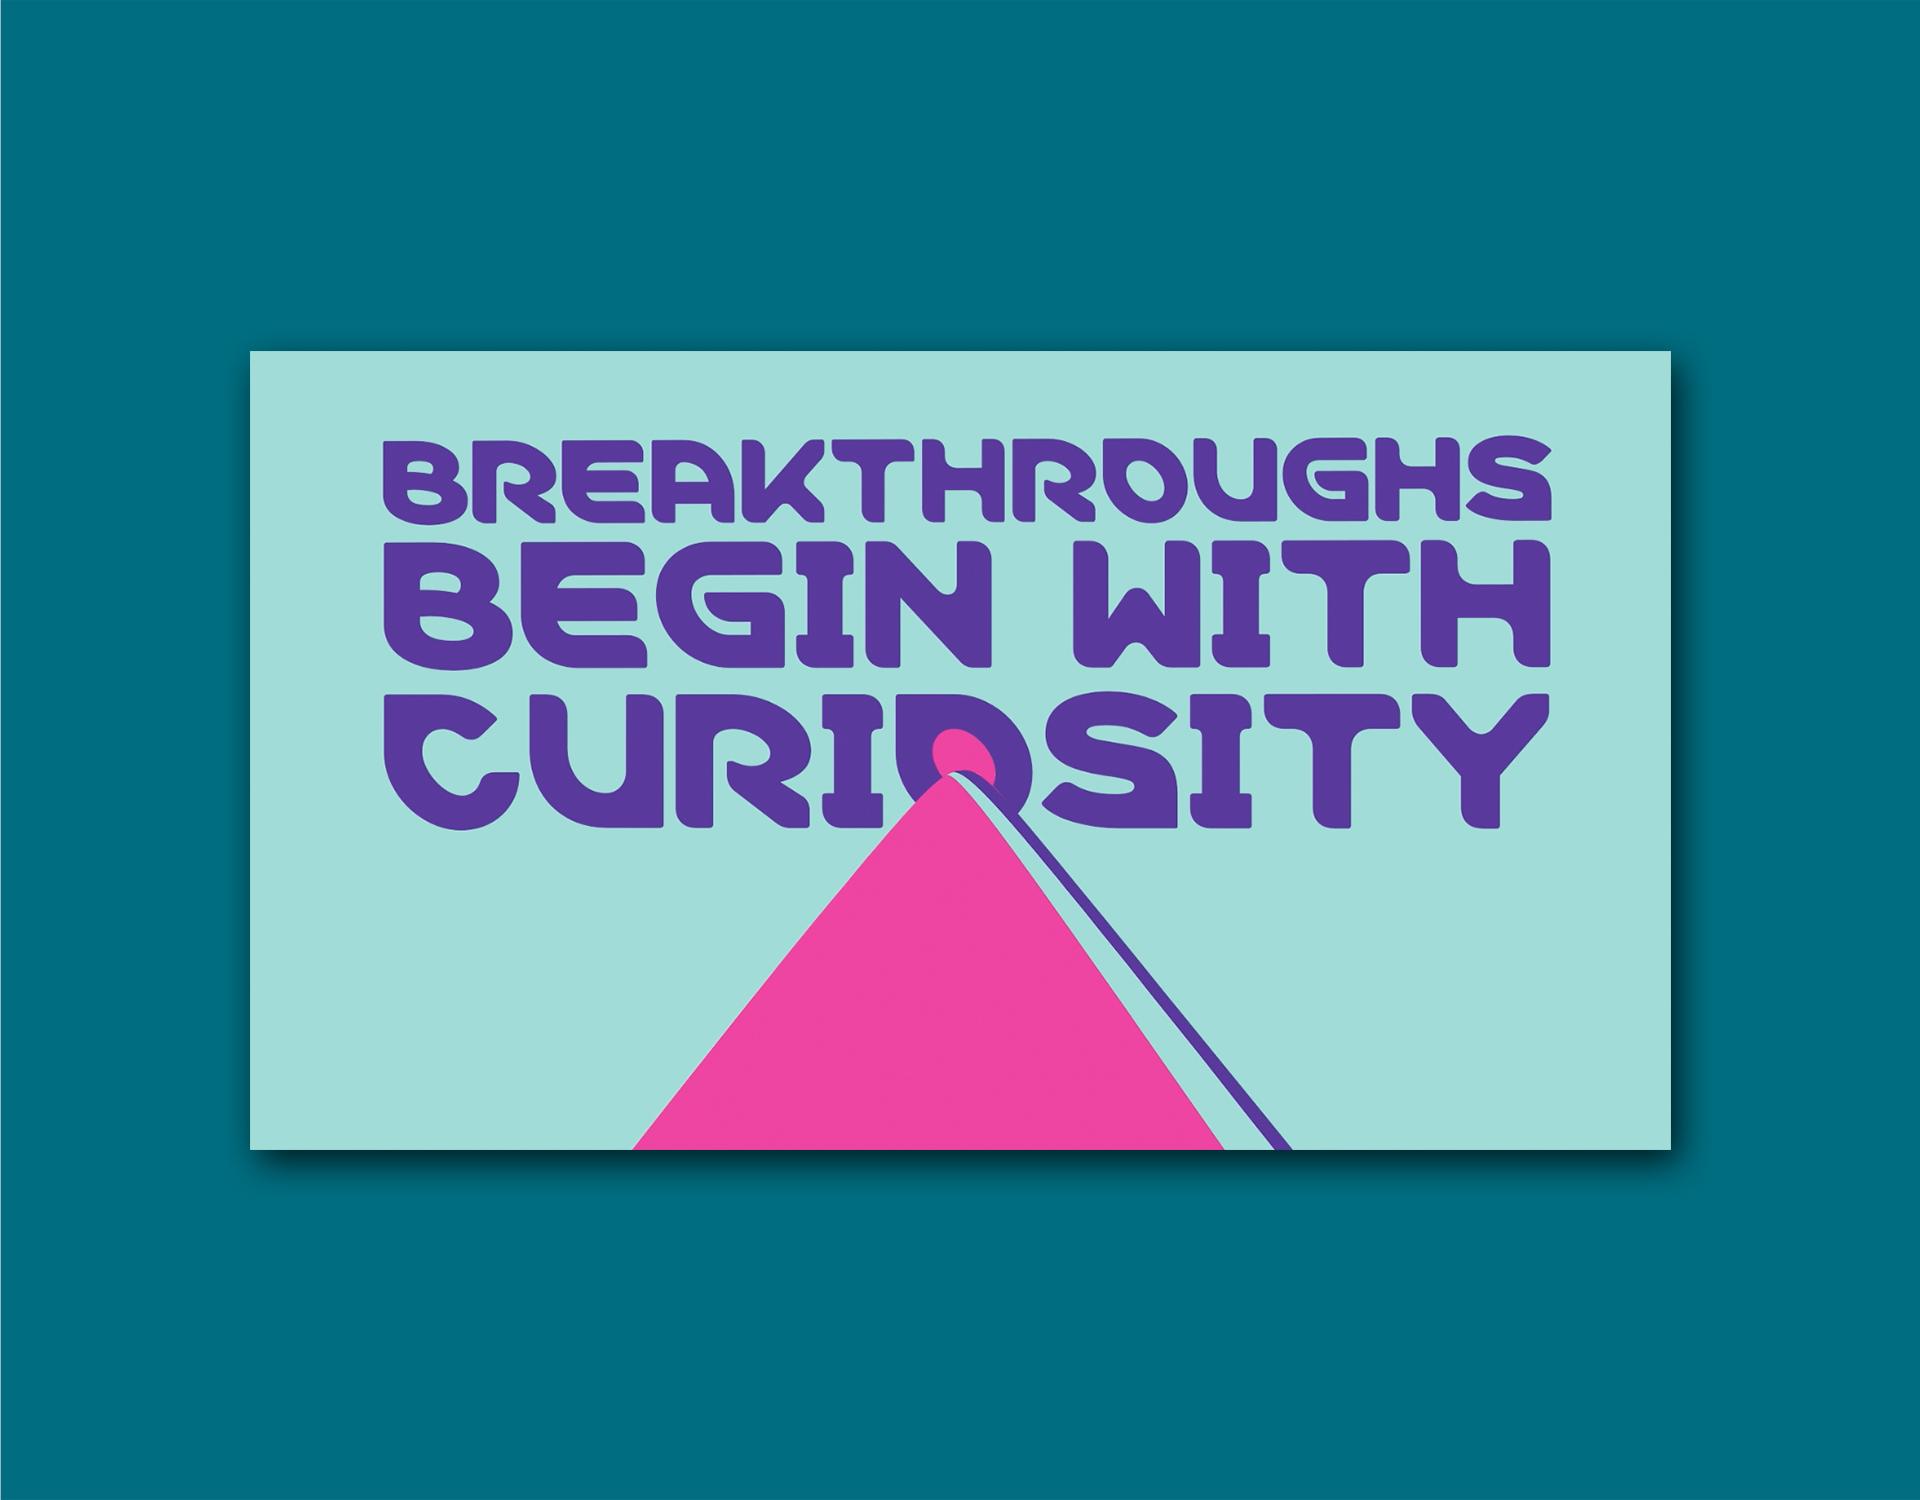 Merck – Why curiosity?